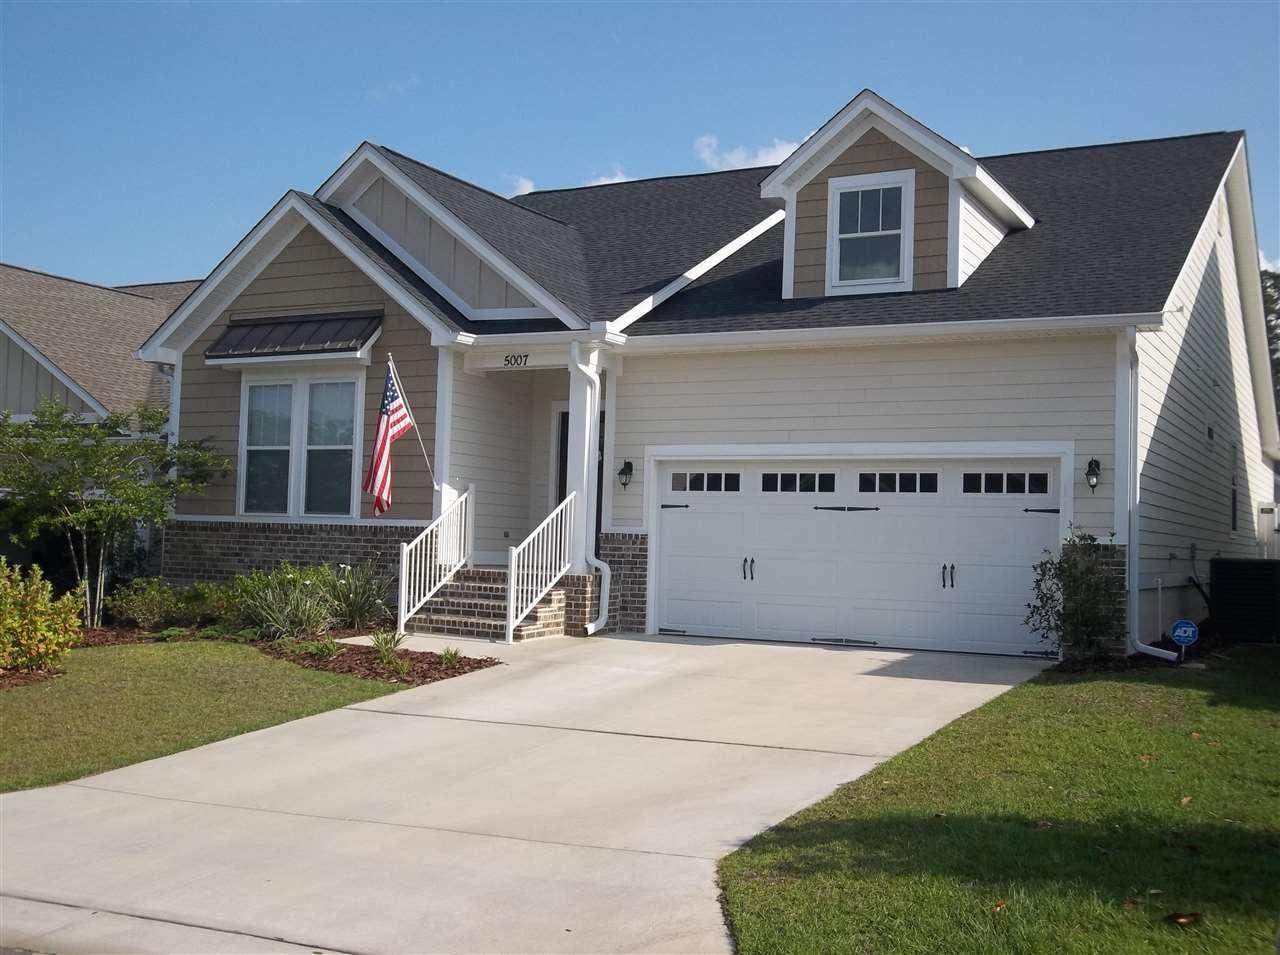 5007 Caracara Drive, Tallahassee, FL 32312 - MLS#: 332070